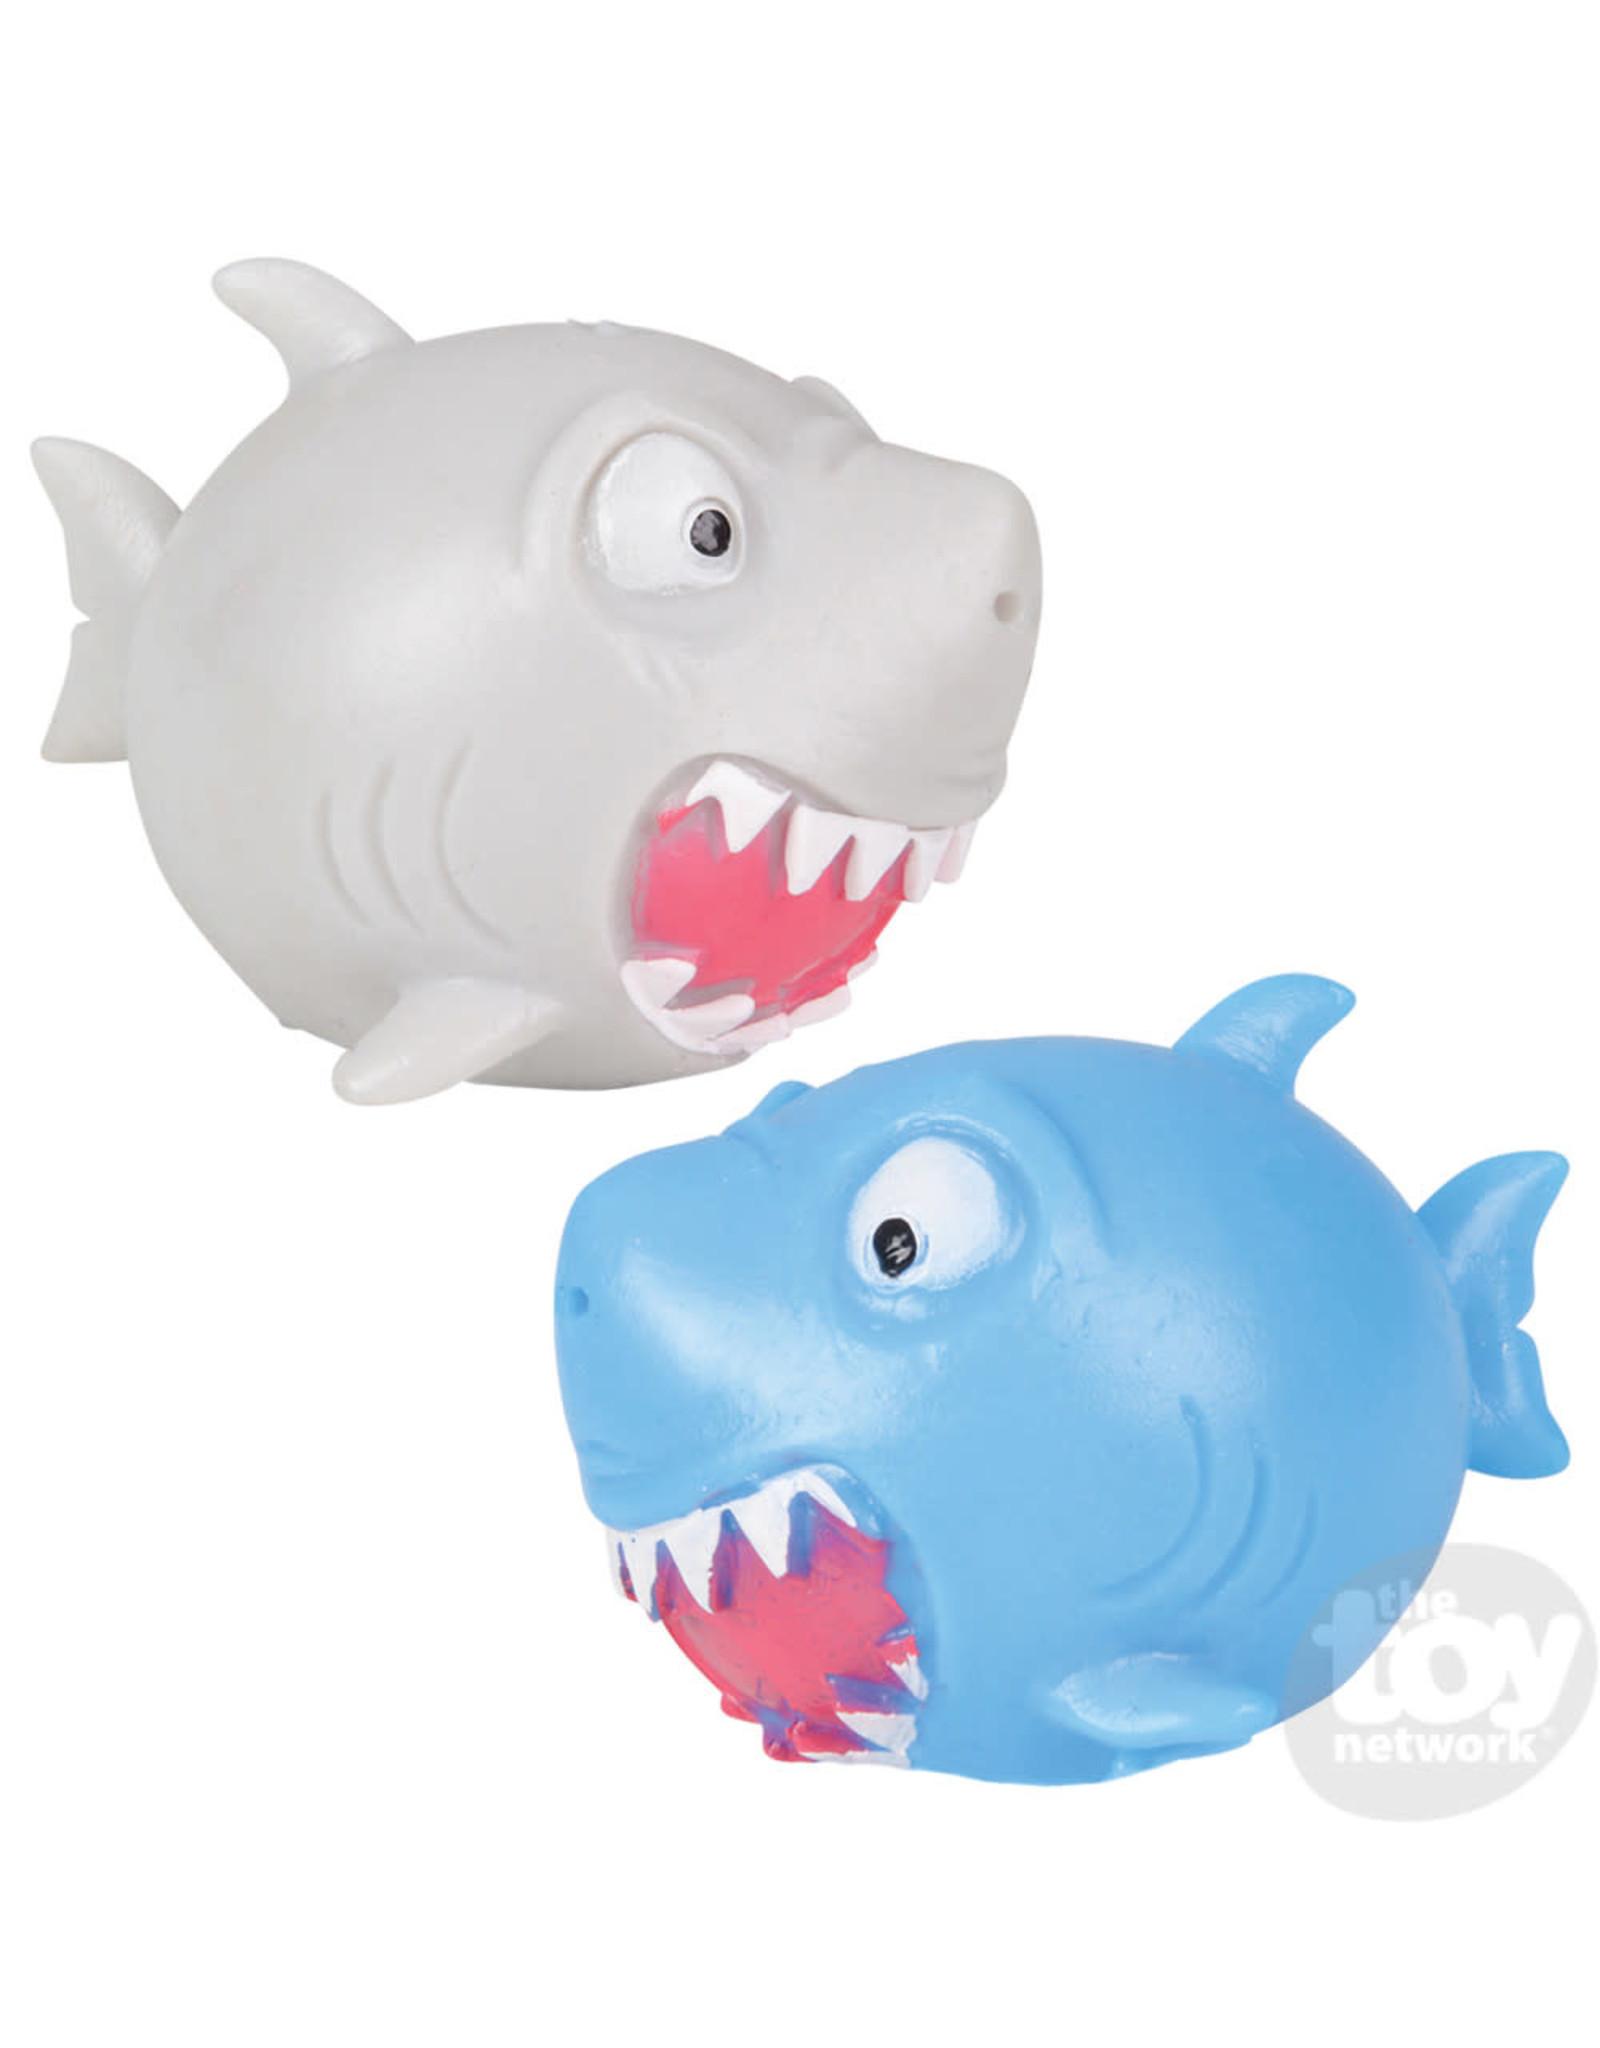 "The Toy Network Splat Shark 3.25"""